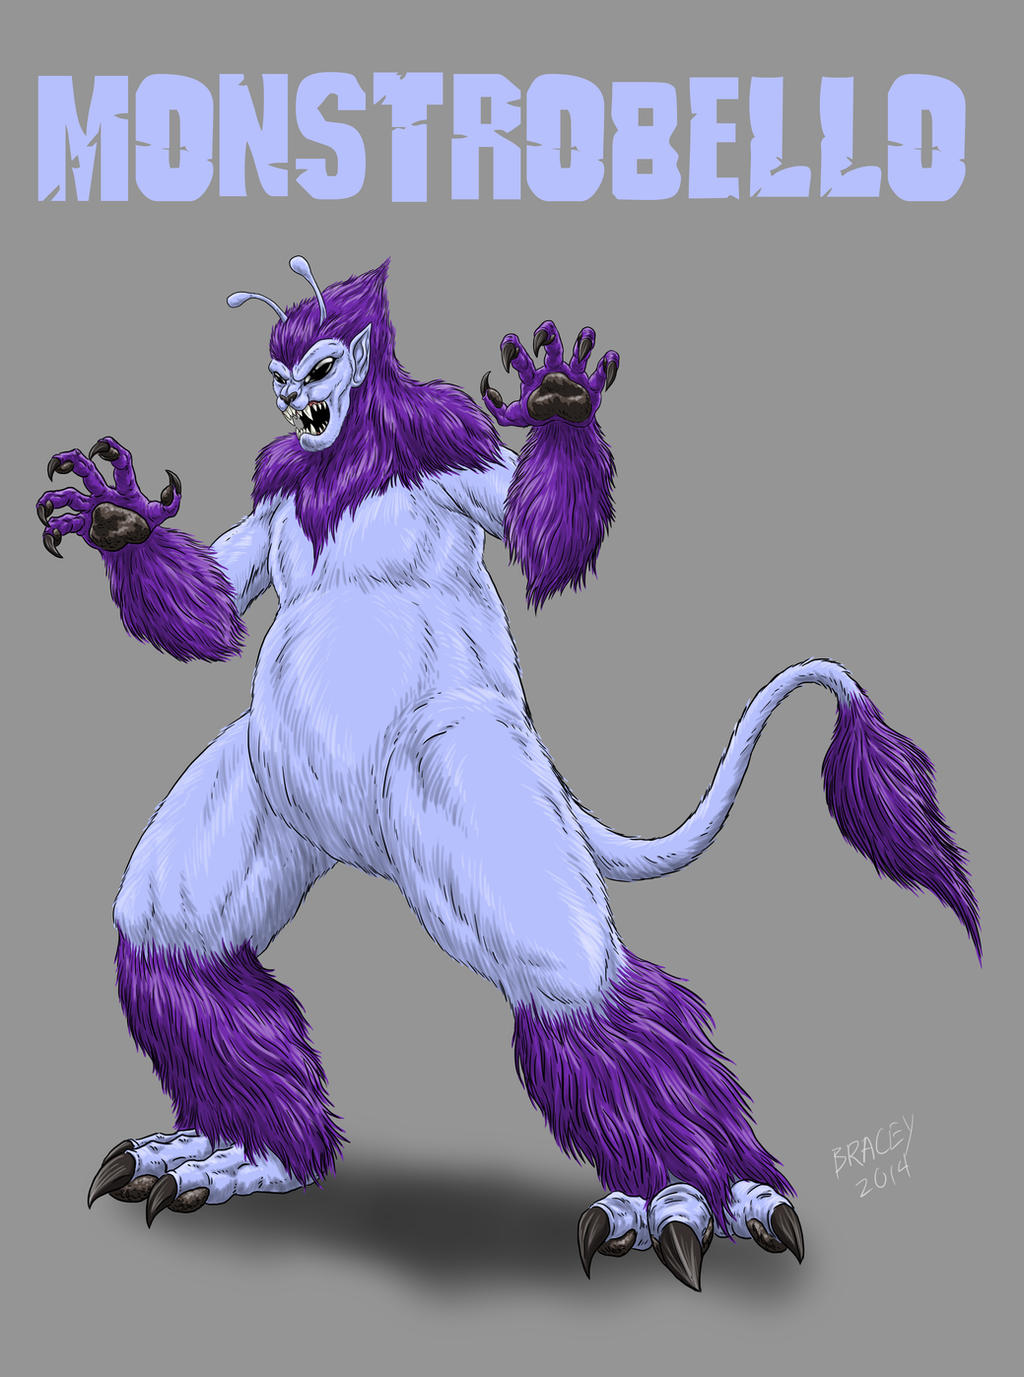 Kaiju Commissions - MonstroBello by Bracey100